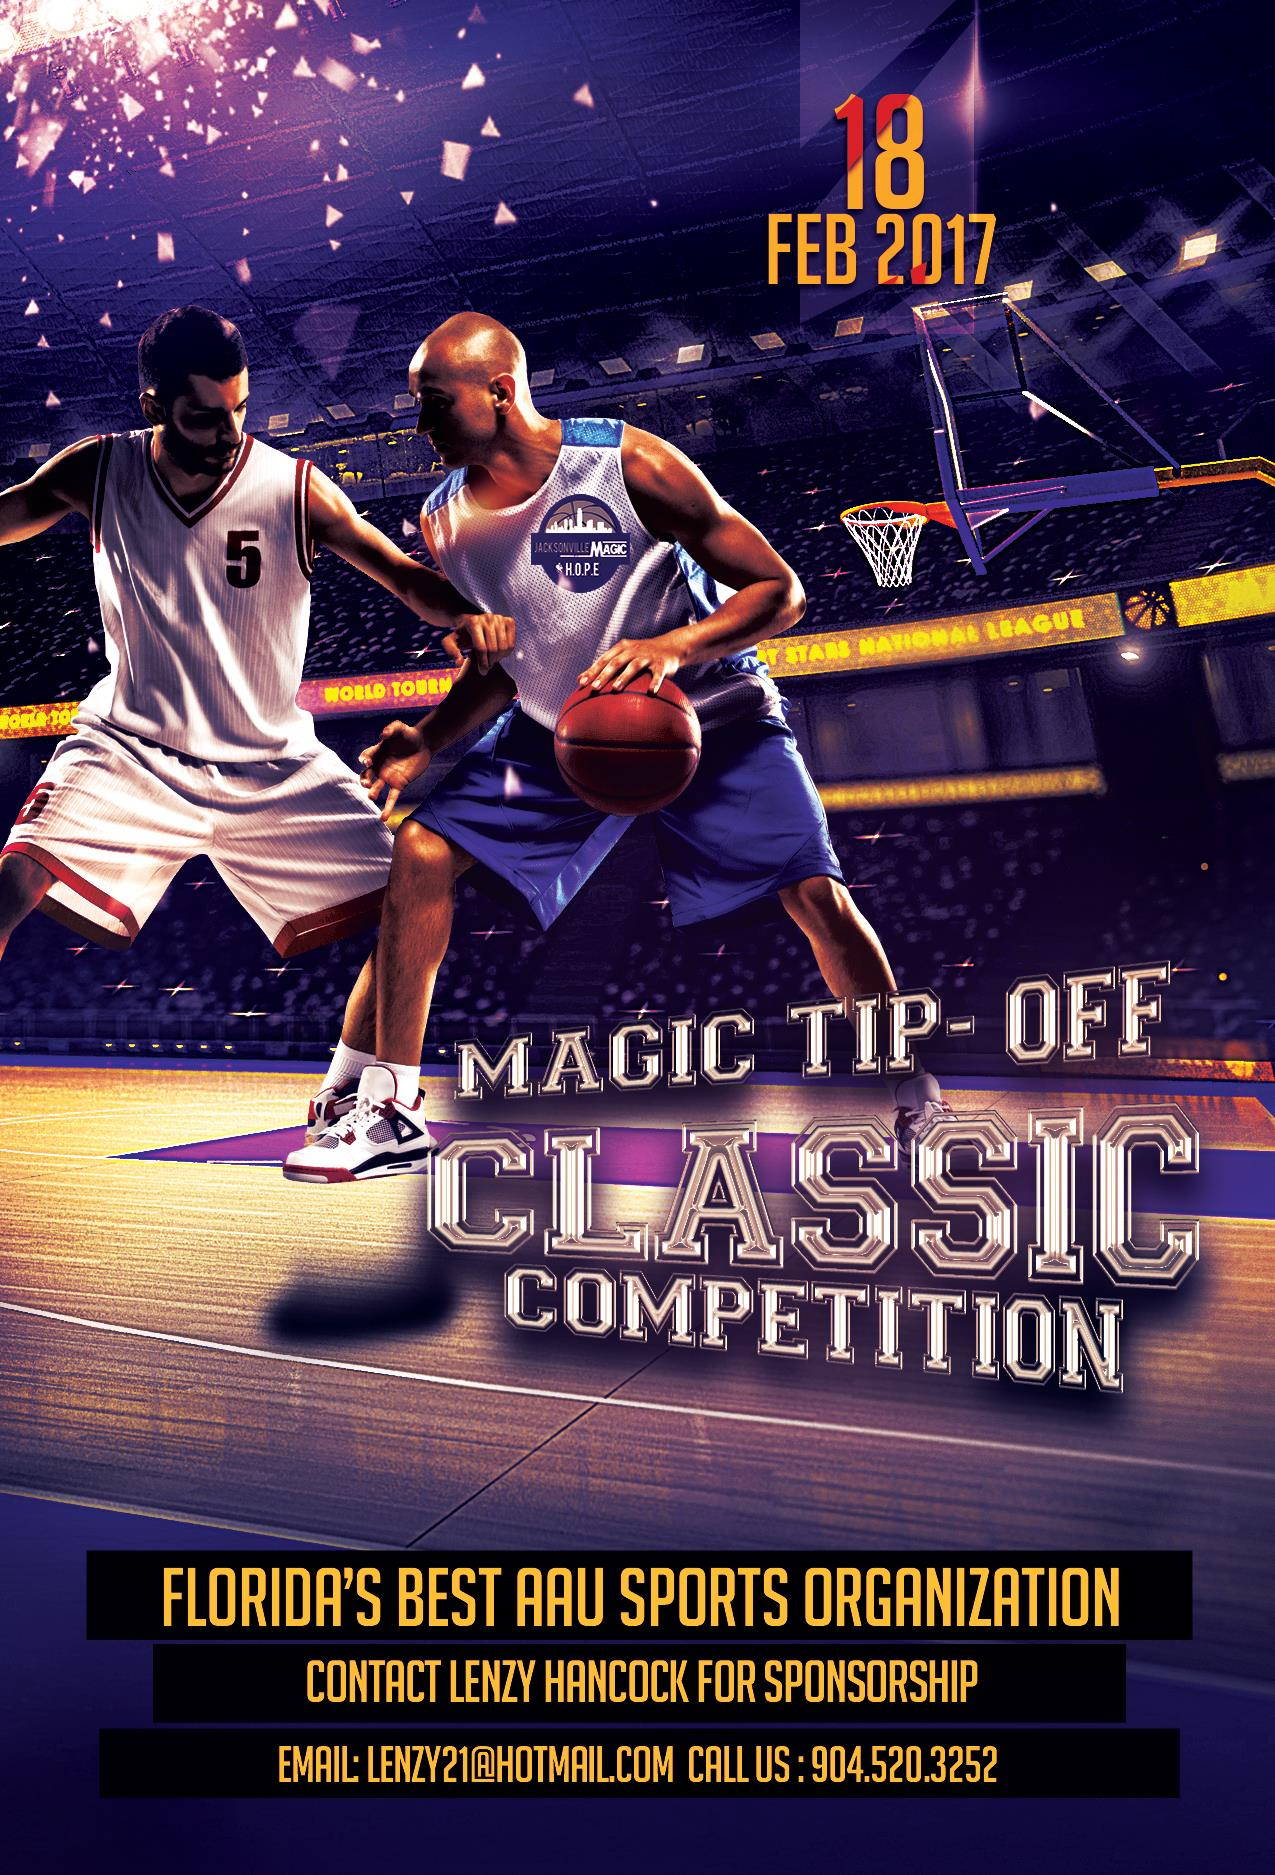 Custom Event Flyer-AAU Sports Xpress Grassroots